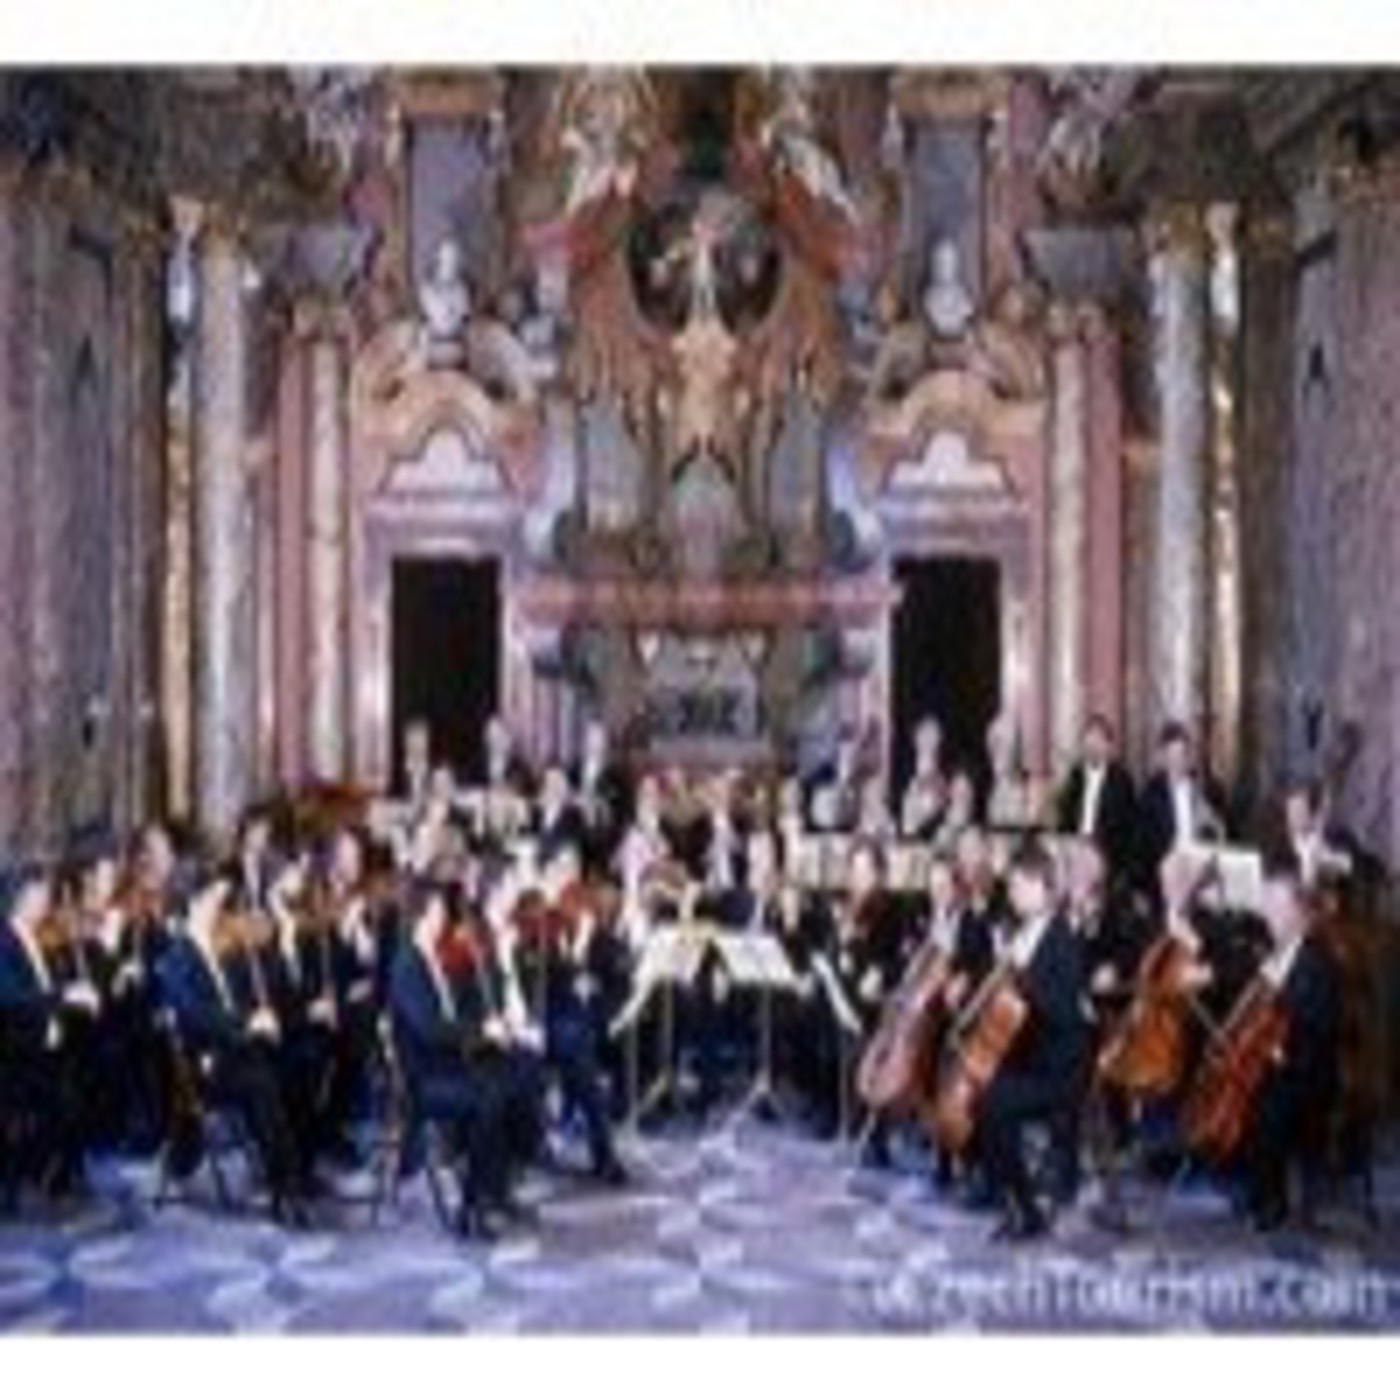 Suite española para guitarra (1674) - Gaspar Sanz (España, 1640-1710)